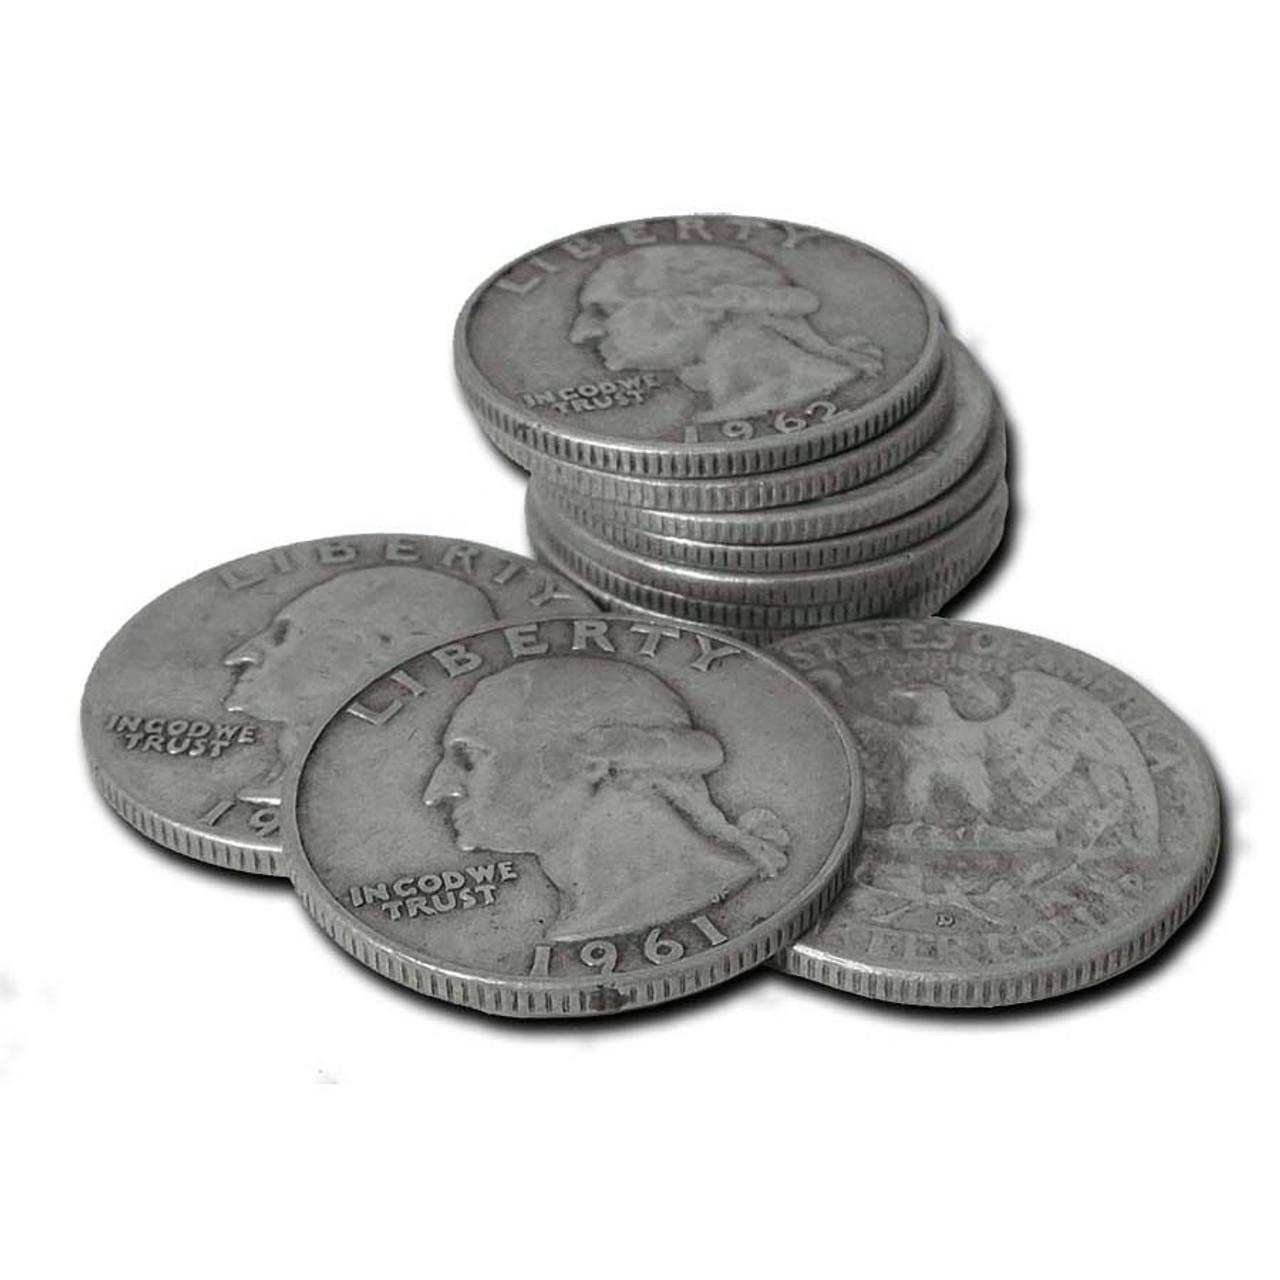 1932-1964 Washington Silver Quarters Set of 10 Different Good to Fine Image 1